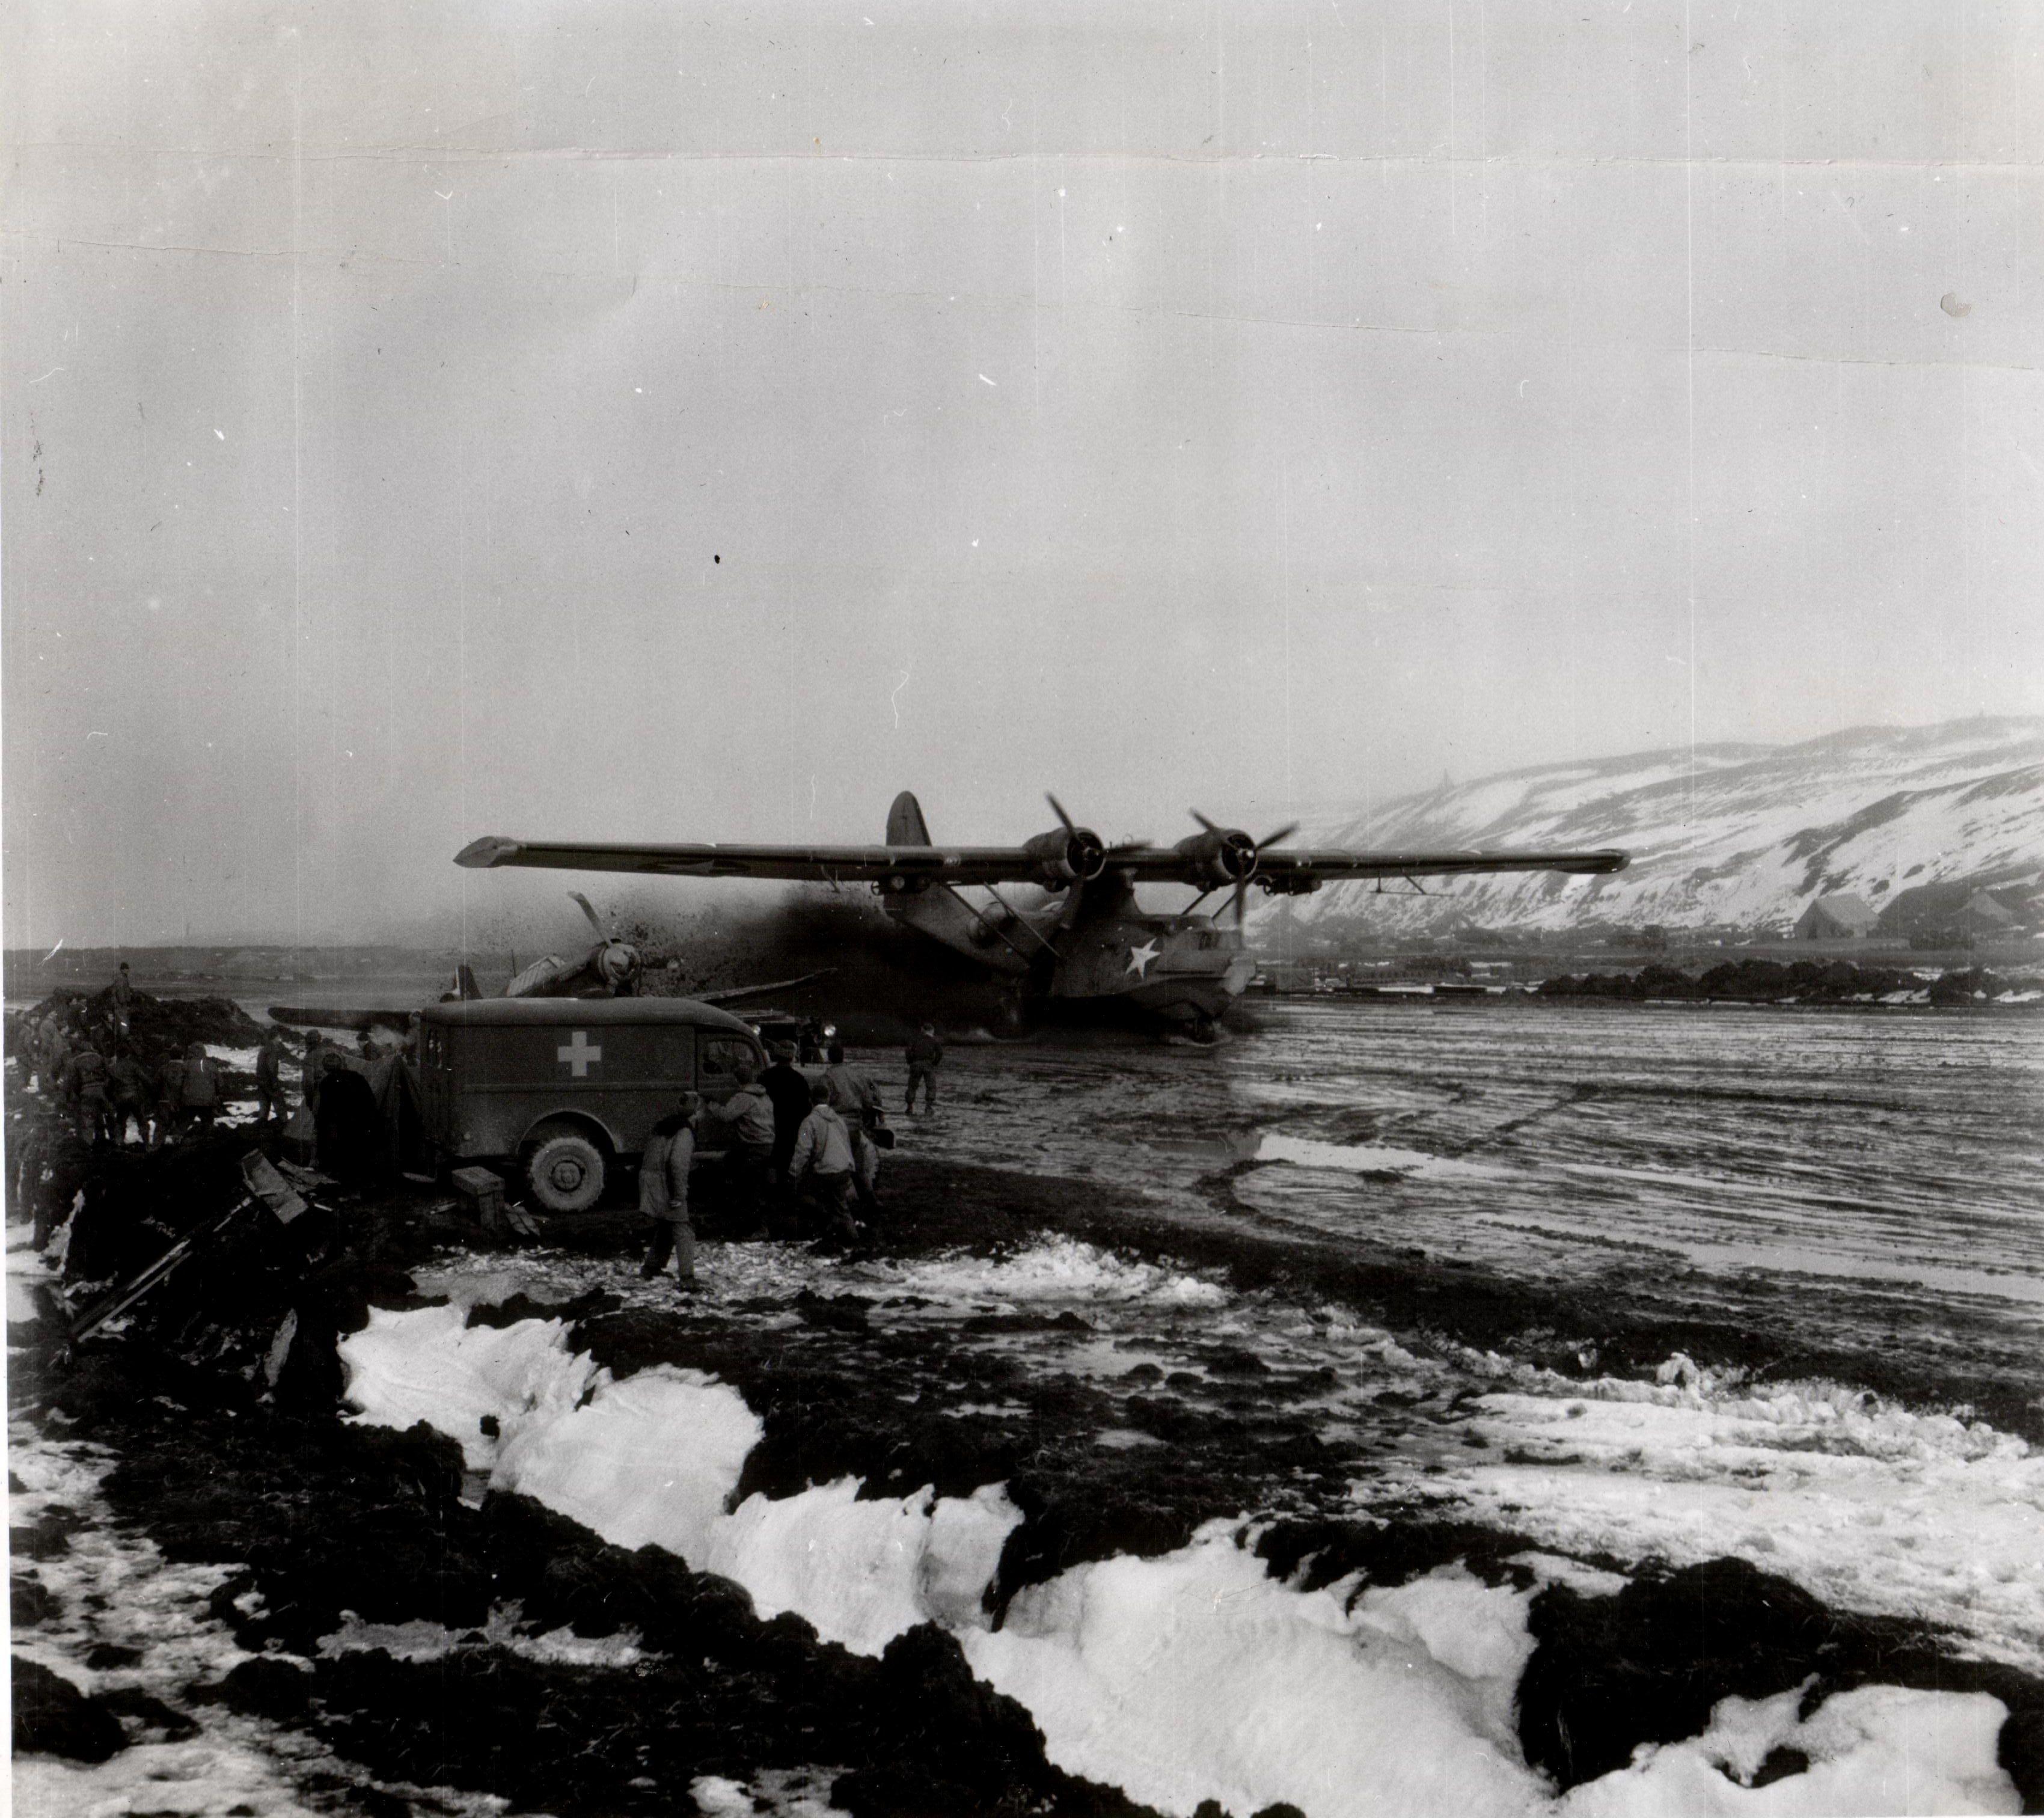 A PBY slinging mud on landing, Aleutian Islands, Alaska